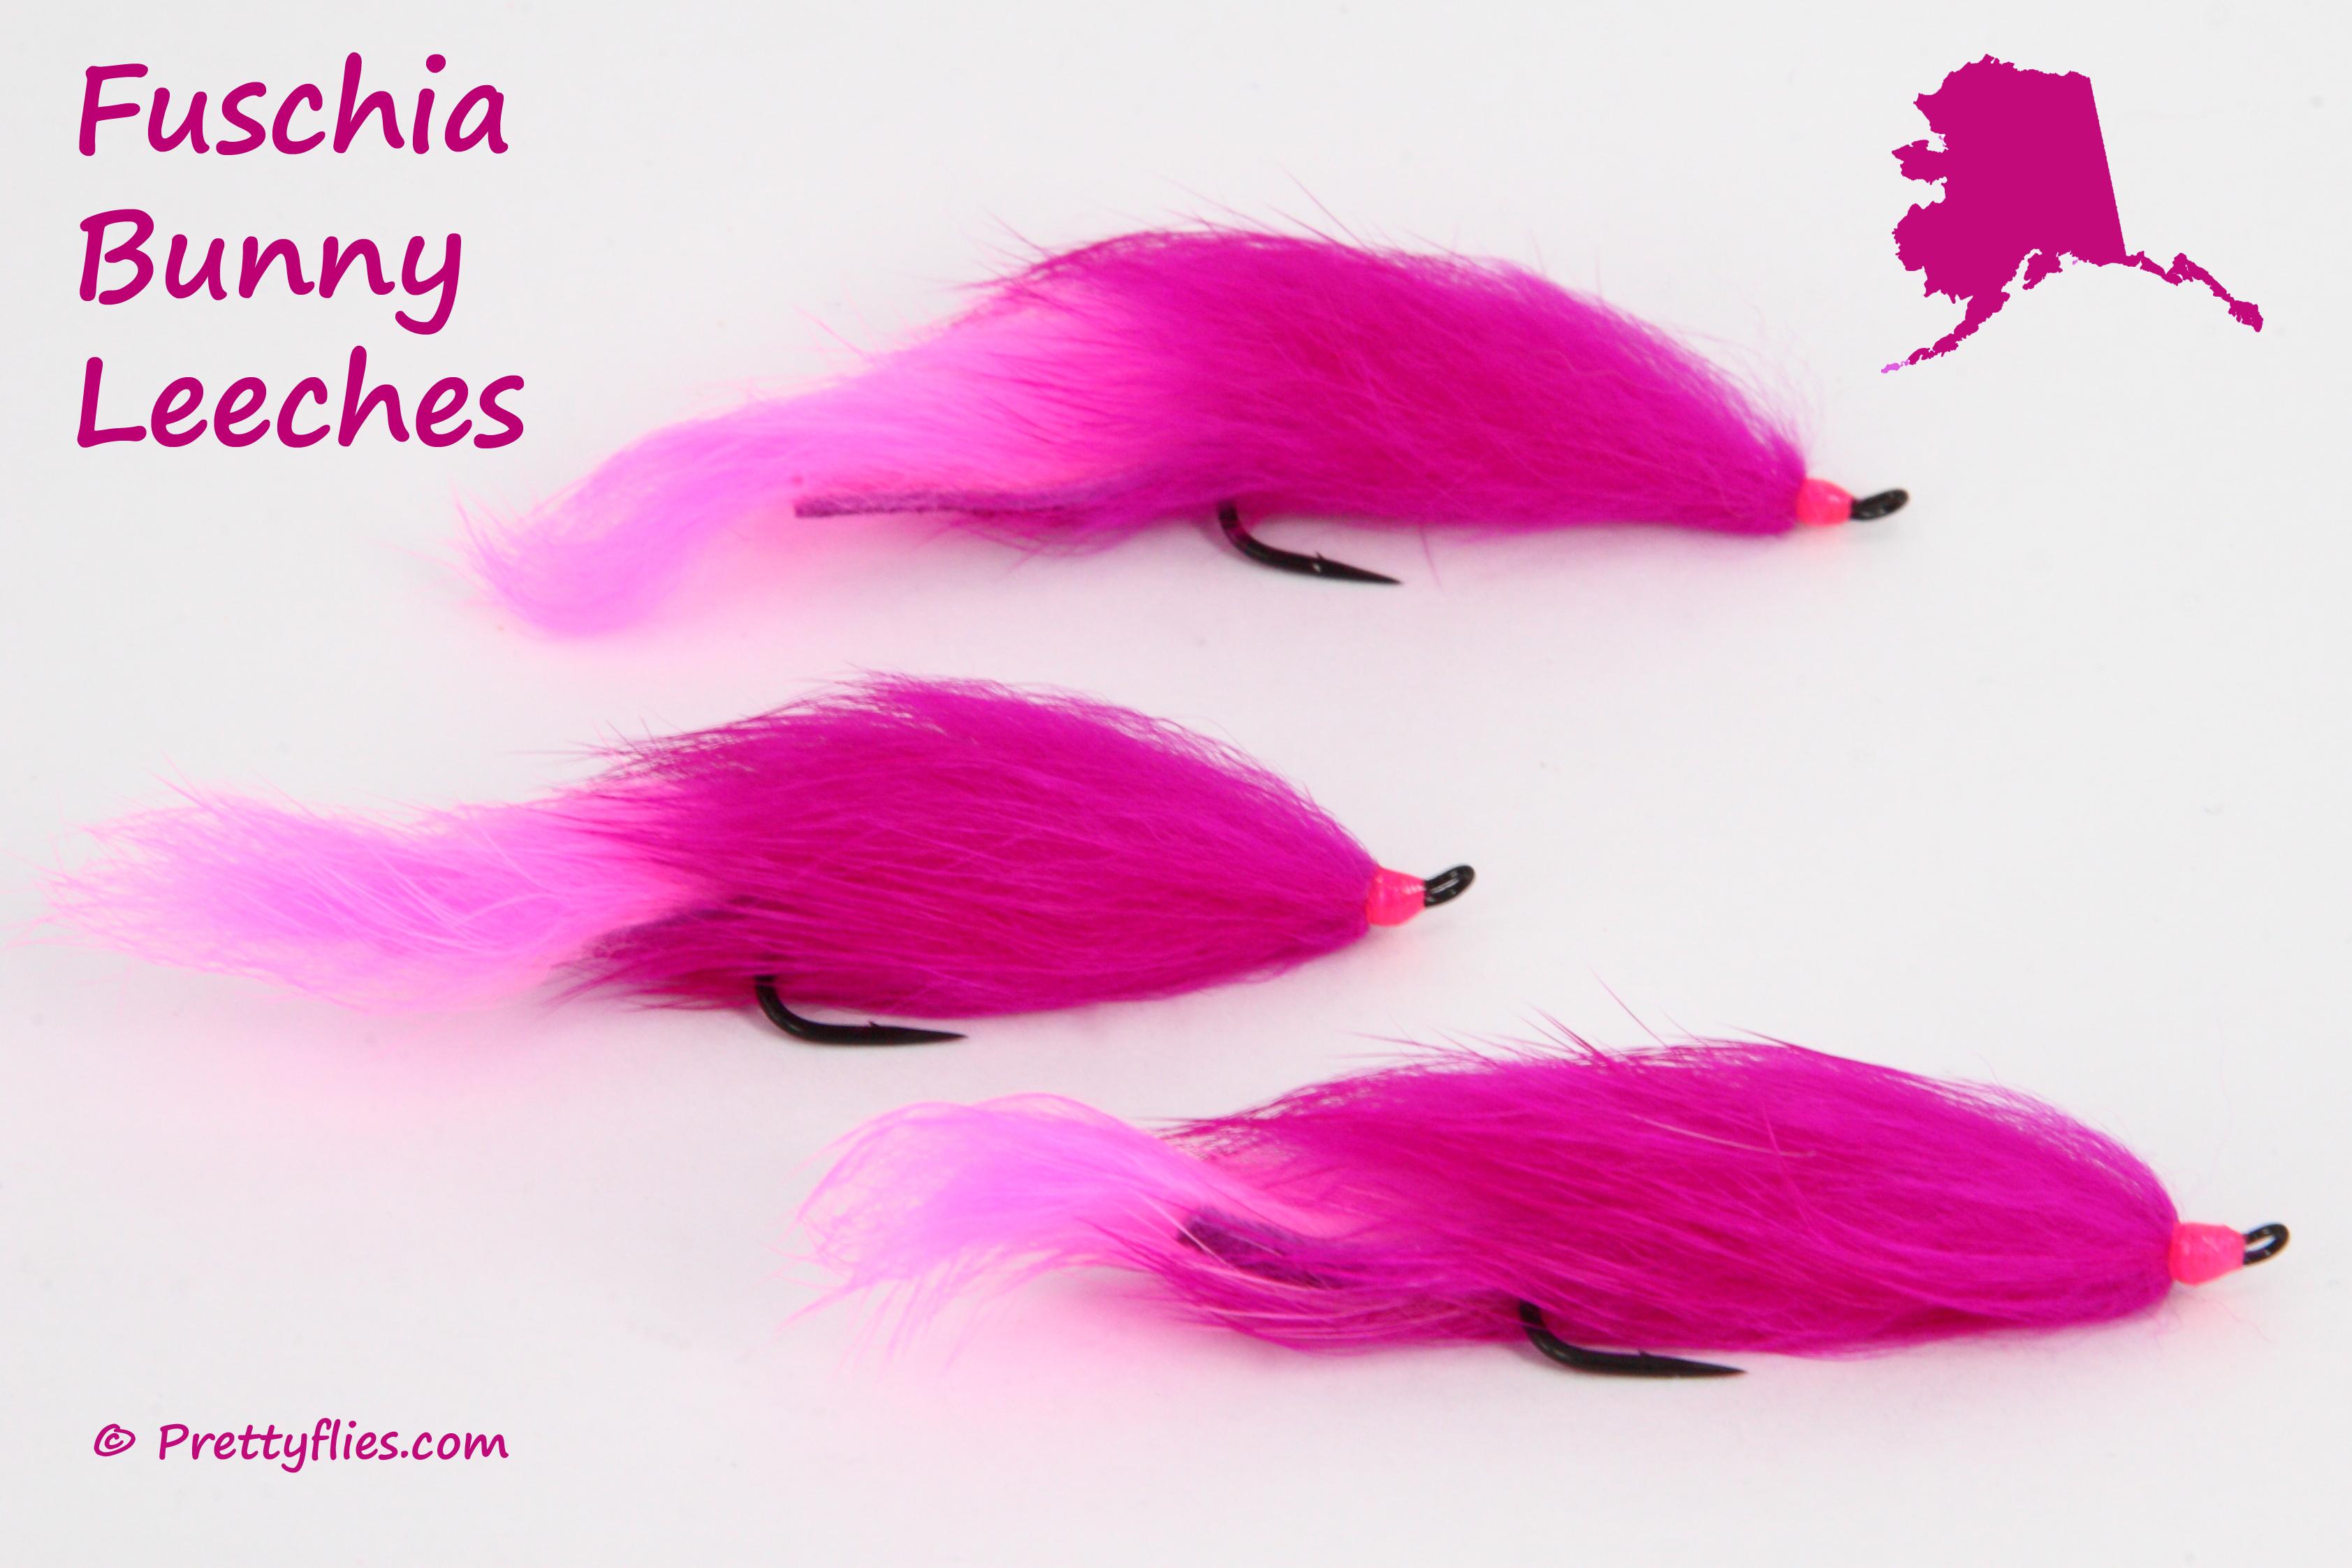 Fuschia Bunny Leeches.jpg